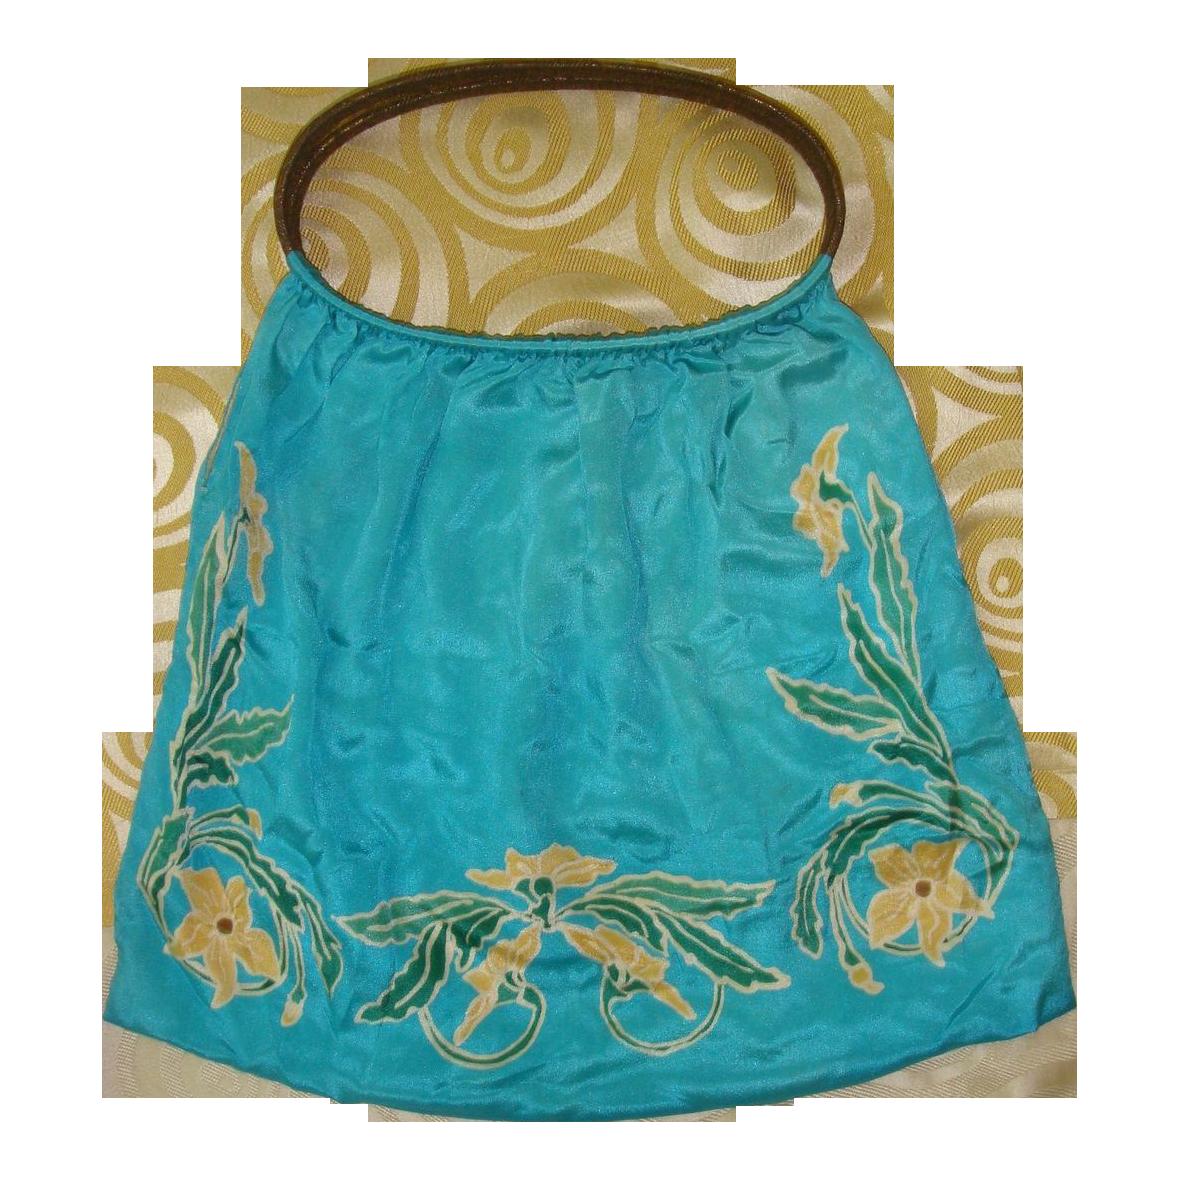 Late Teens WWI Era Turquoise Silk Knitting Bag Purse